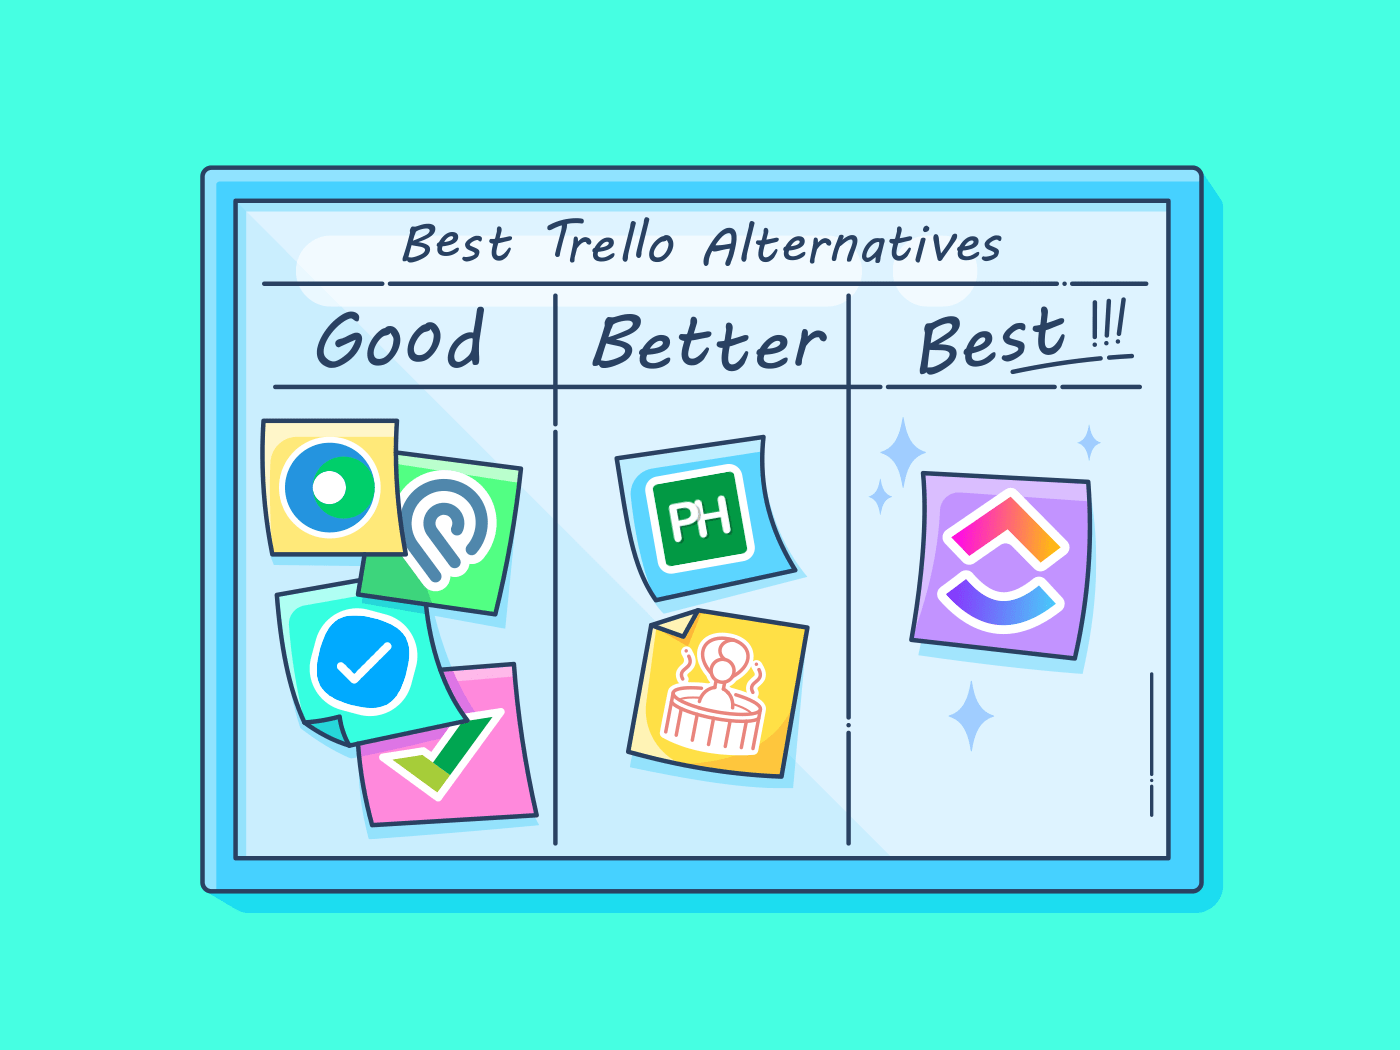 7 Best Trello Alternatives in 2021.